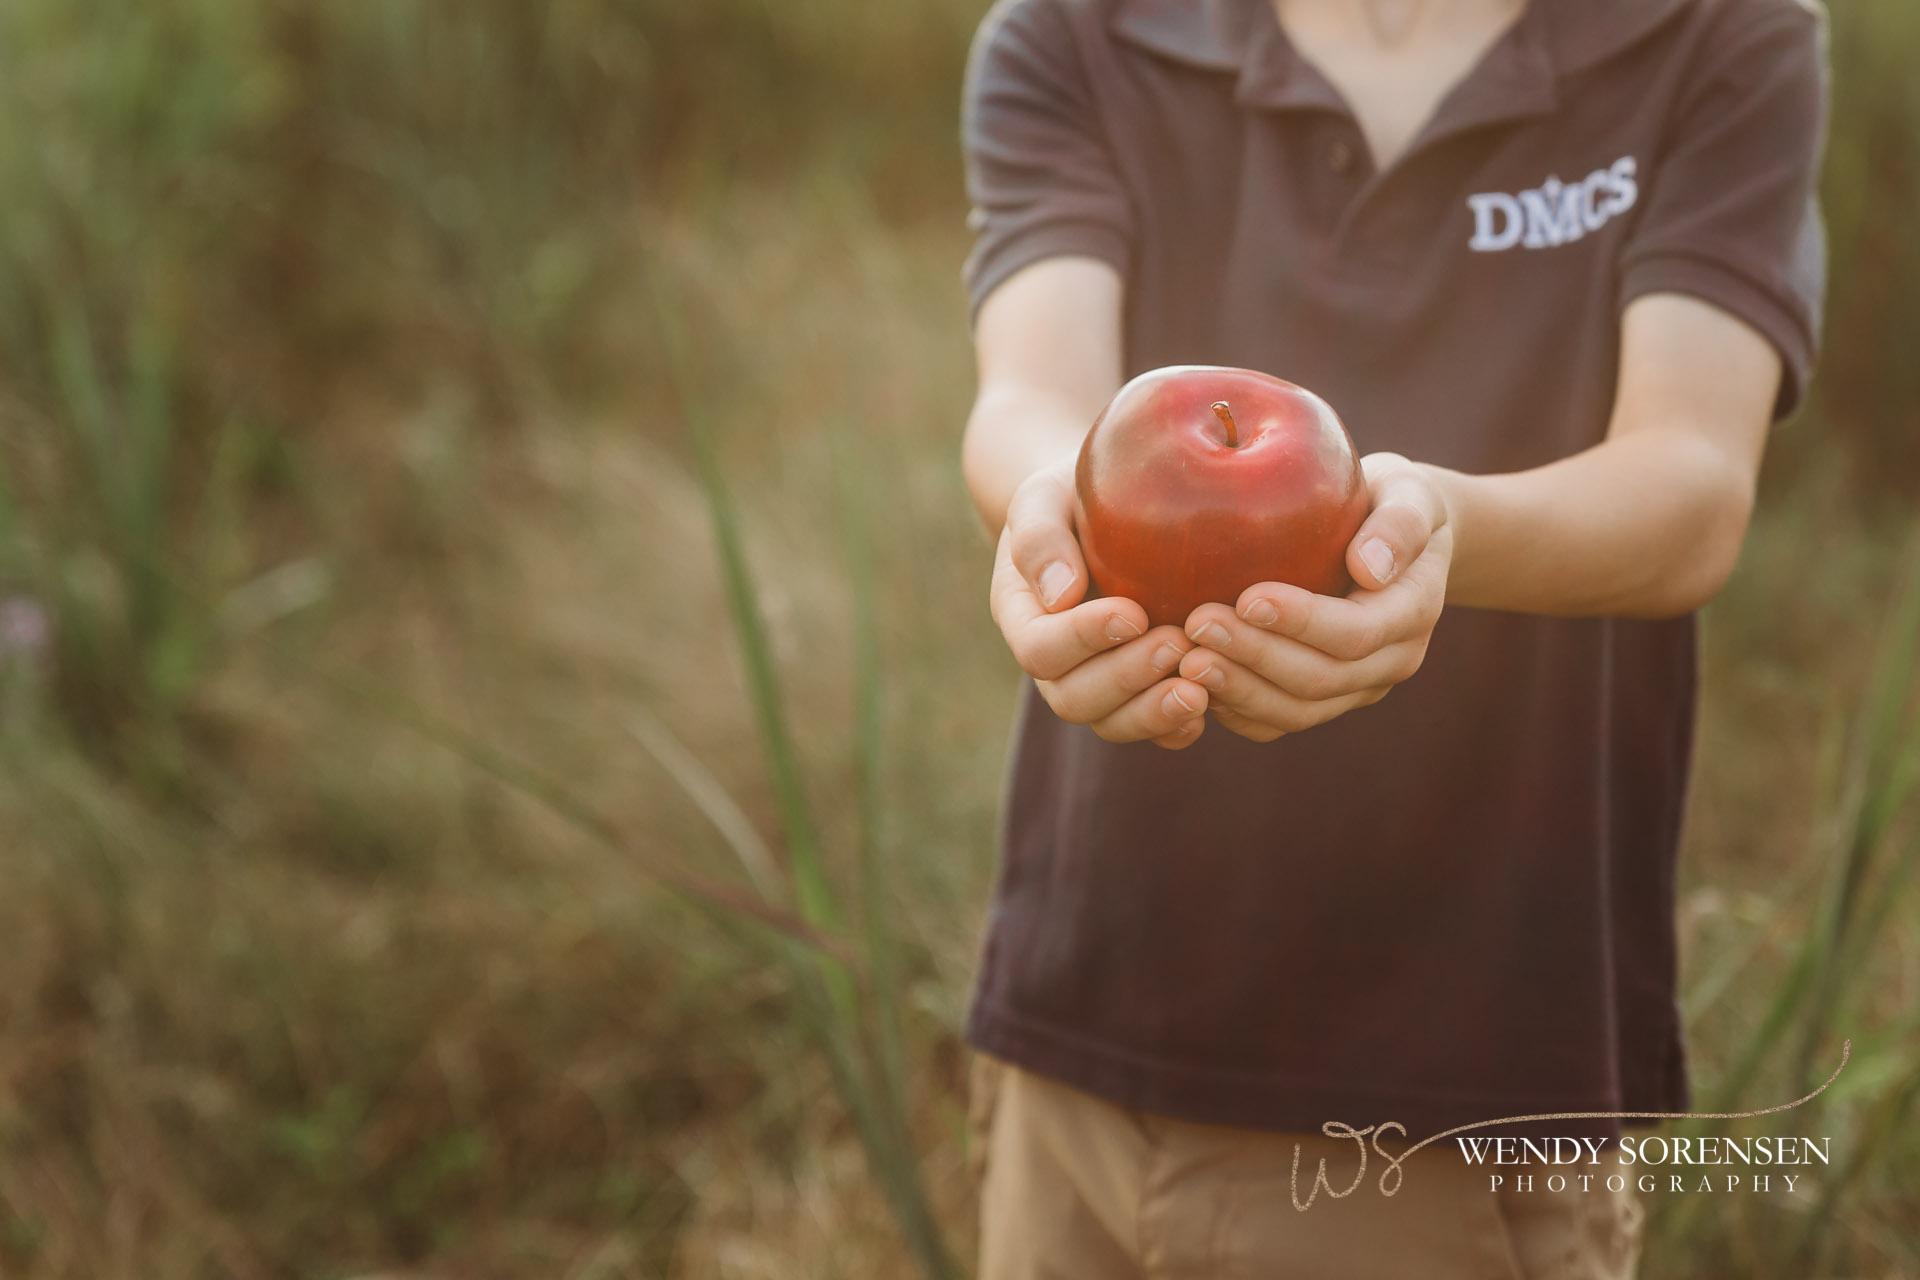 Des-Moines-Photography-3.jpg